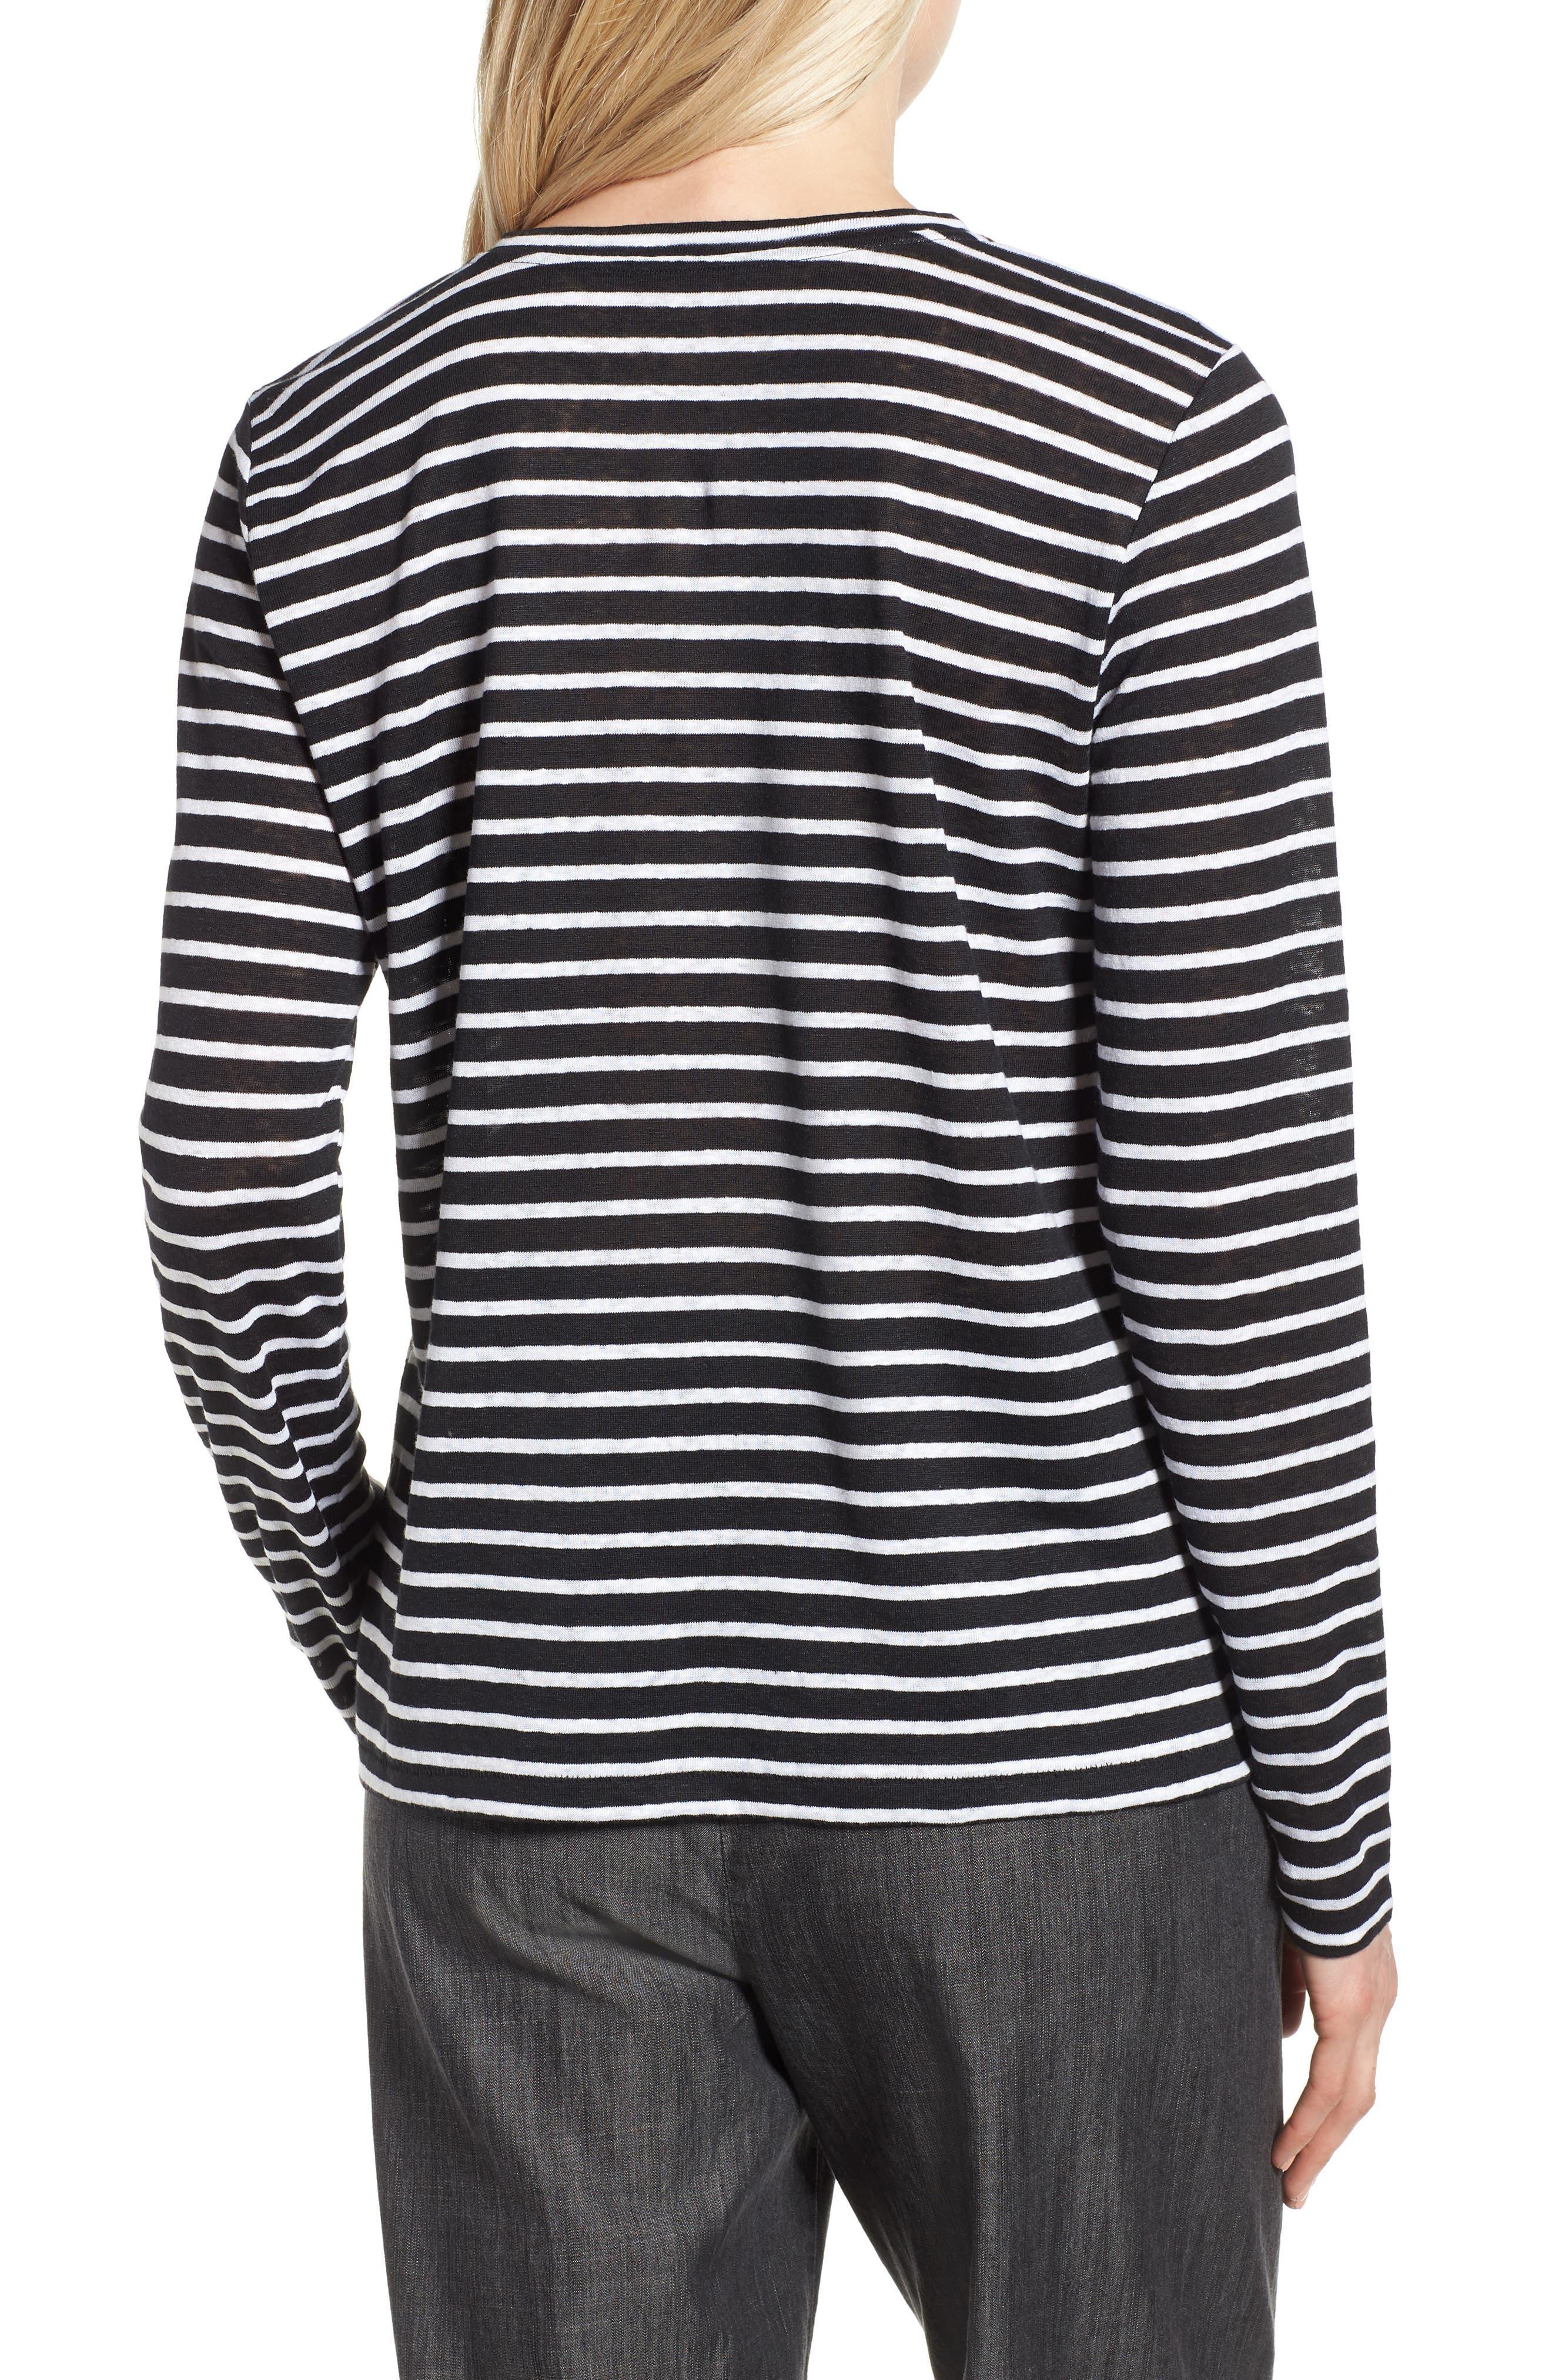 Stripe Organic Linen Top,                             Alternate thumbnail 2, color,                             Black/ White